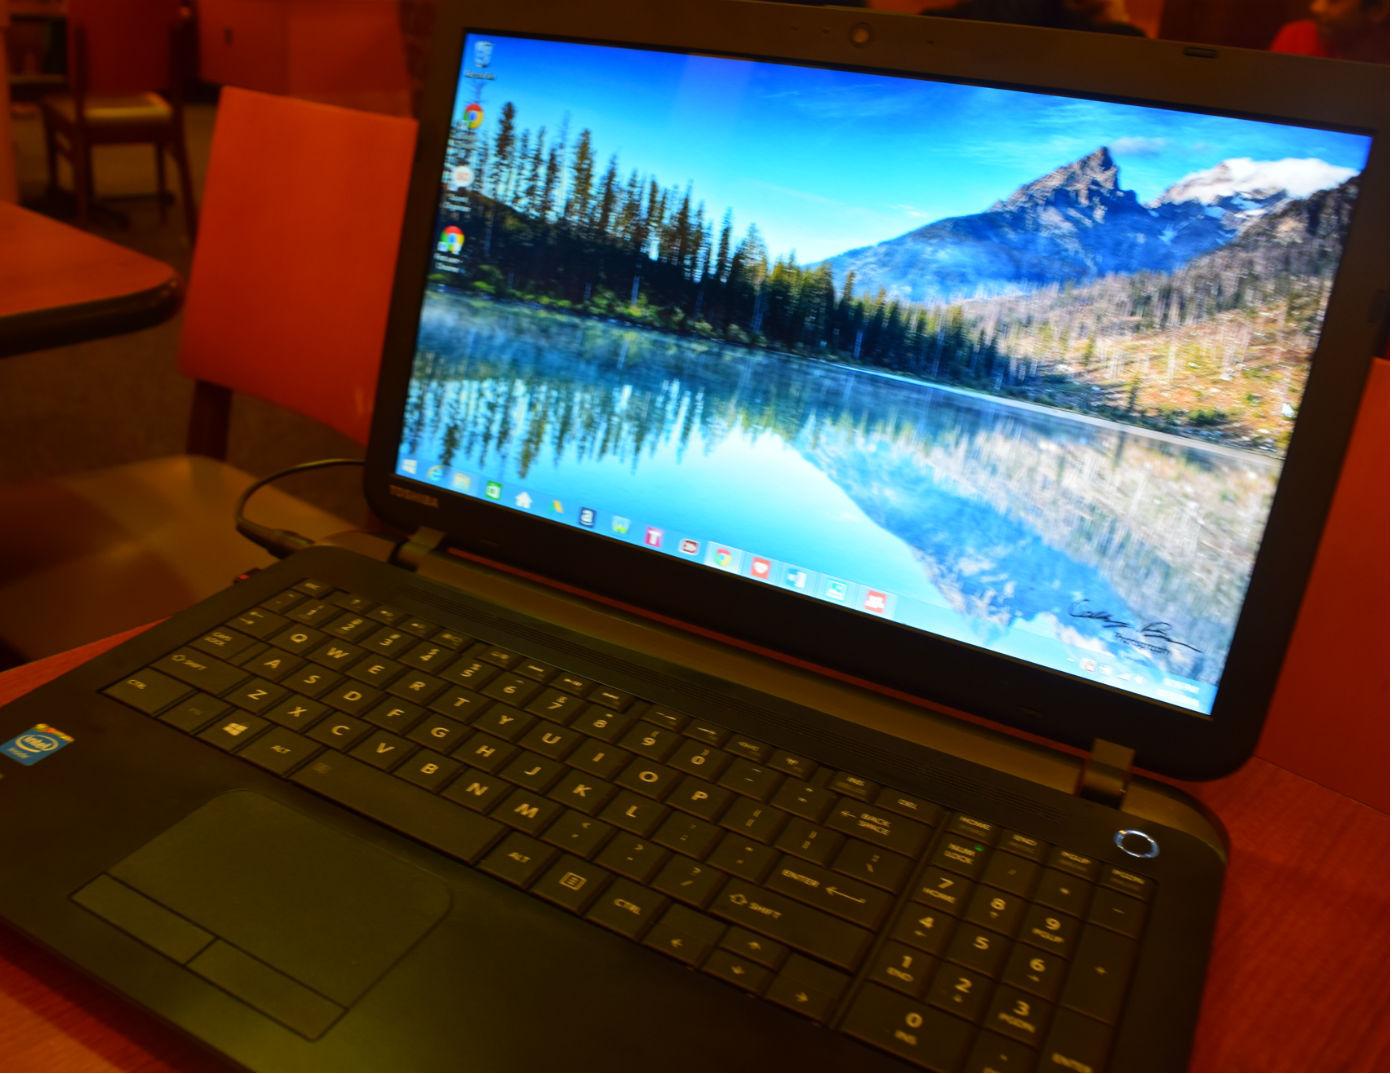 f03392e1ff12a544222e_technology.jpg